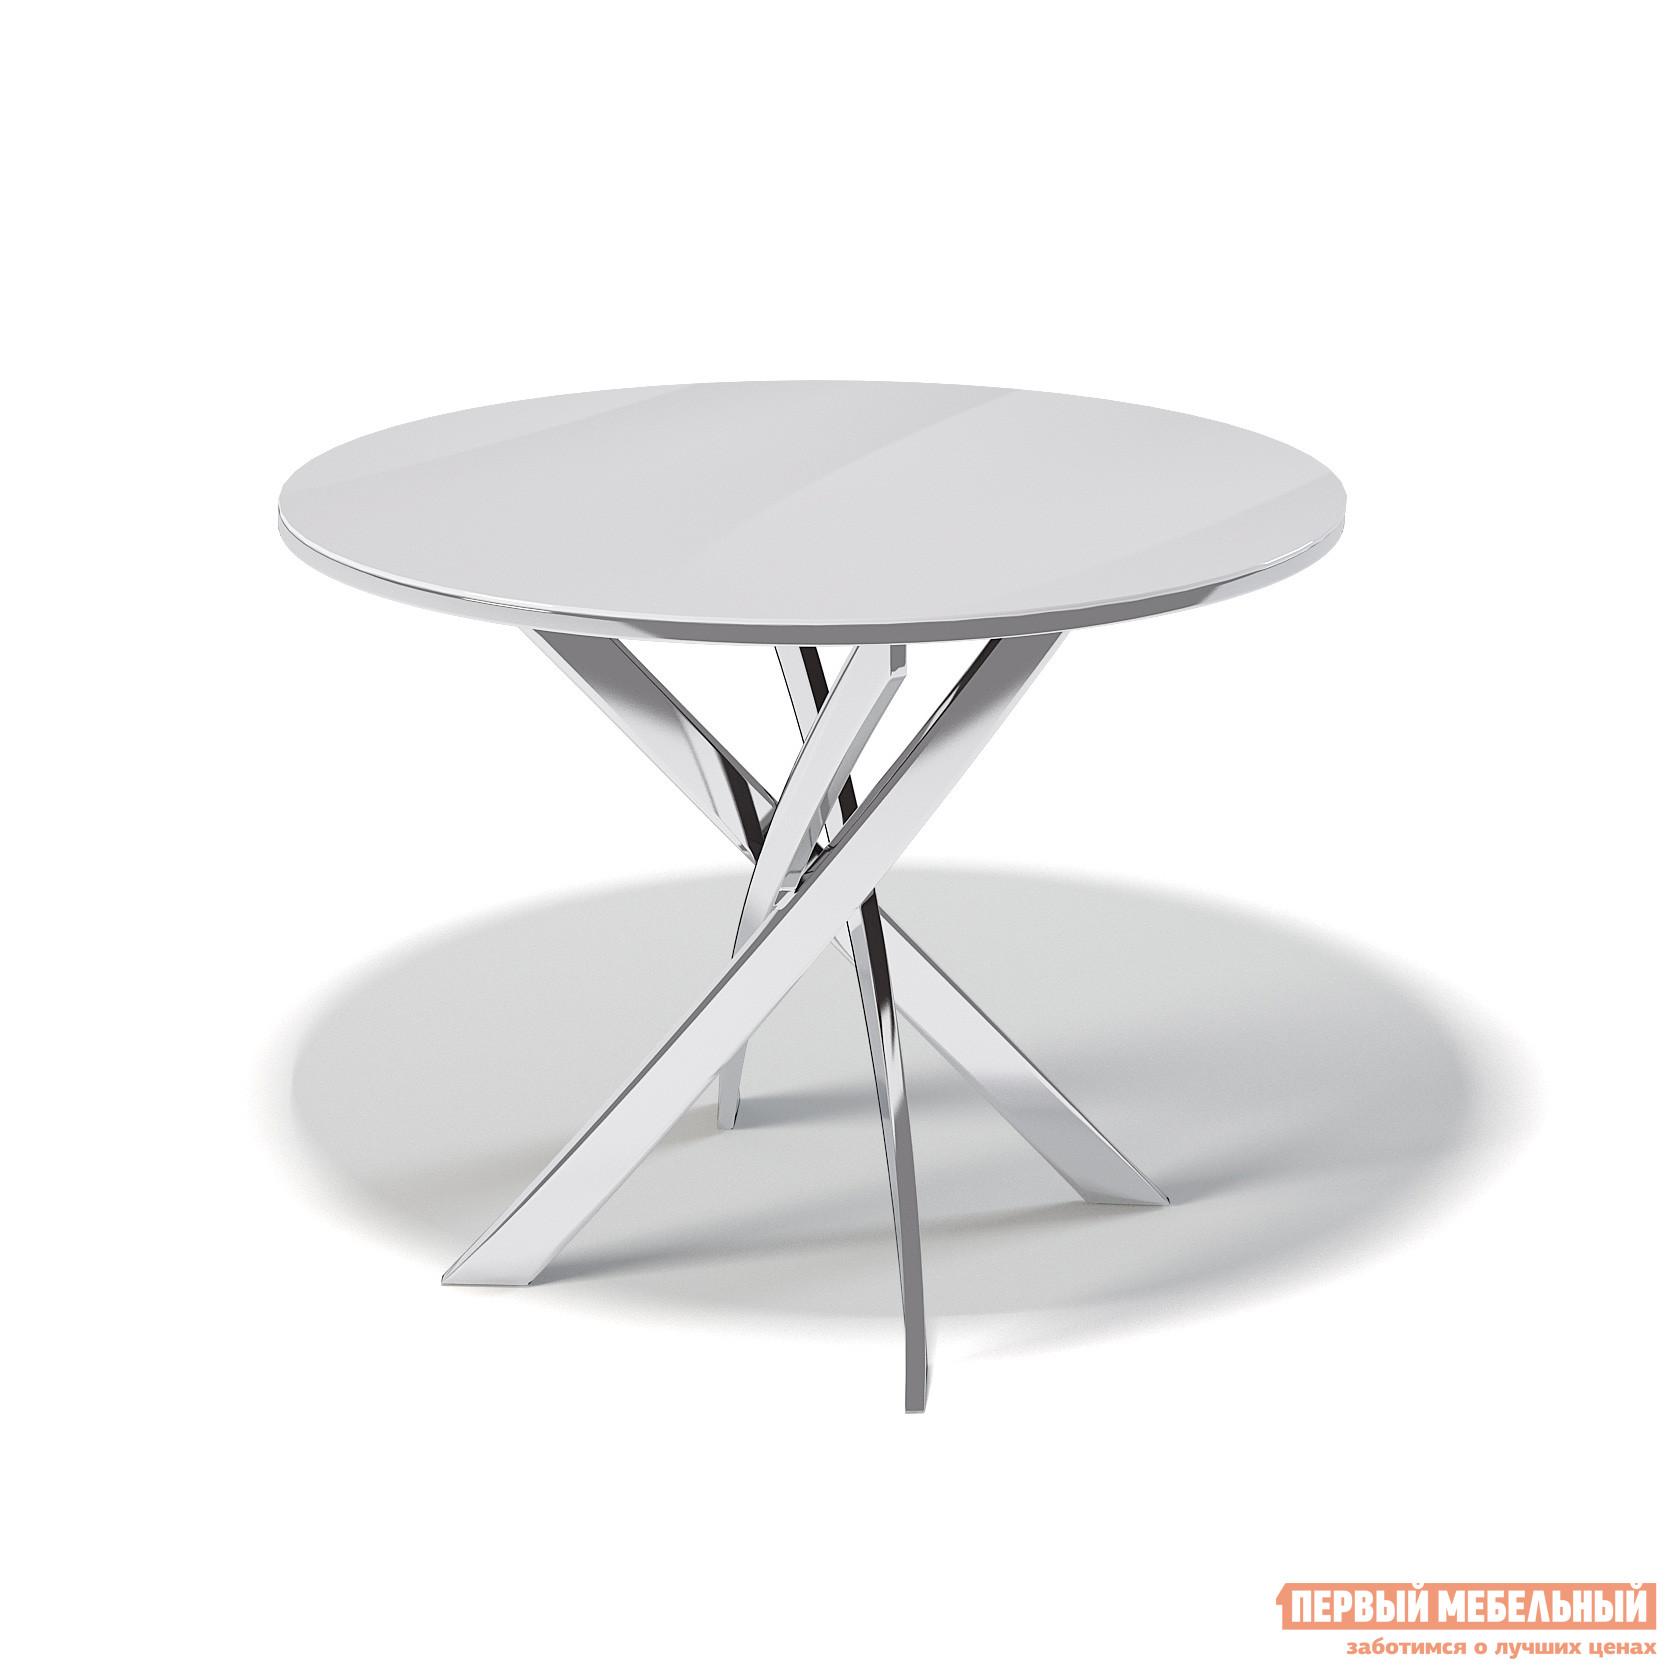 Круглый кухонный стол стеклянный ДИК KENNER R1000